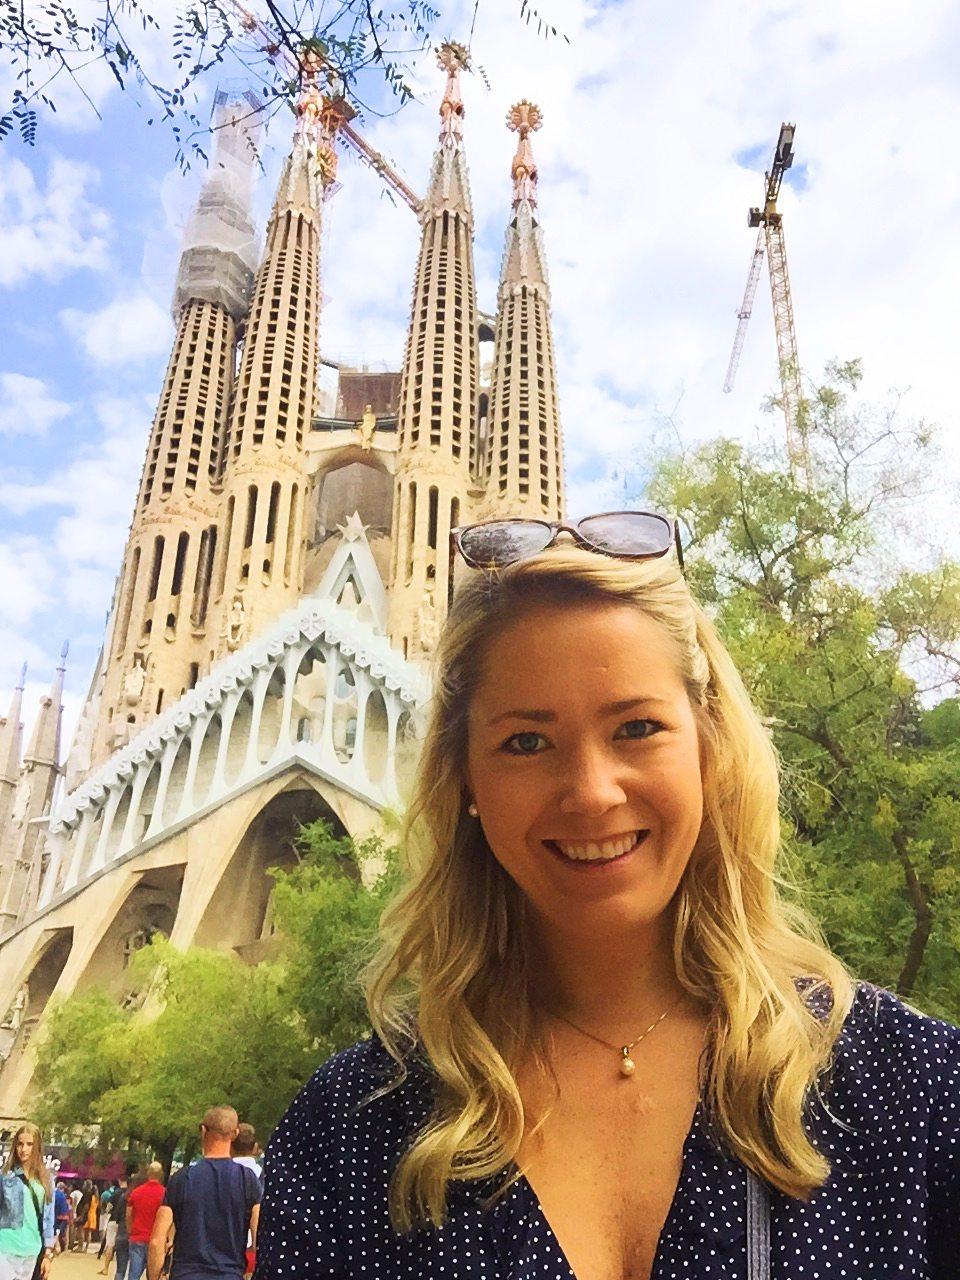 Me taking a selfie at La Sagrada Familia